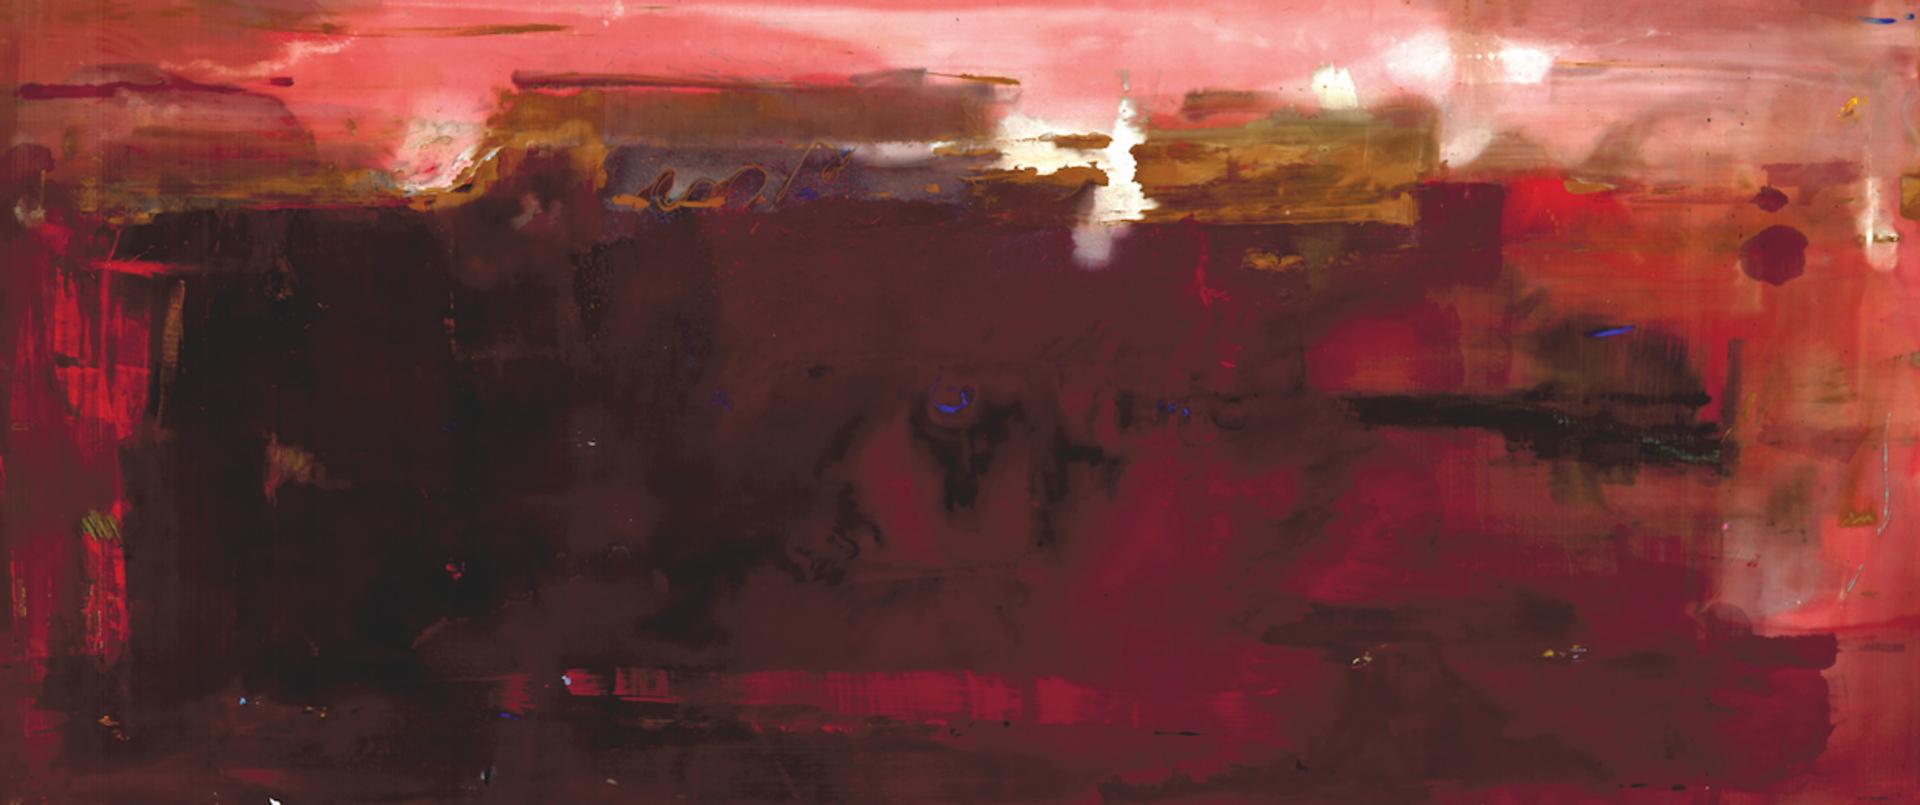 Helen Frankenthaler, Carousel (1979) Palm Springs Art Museum